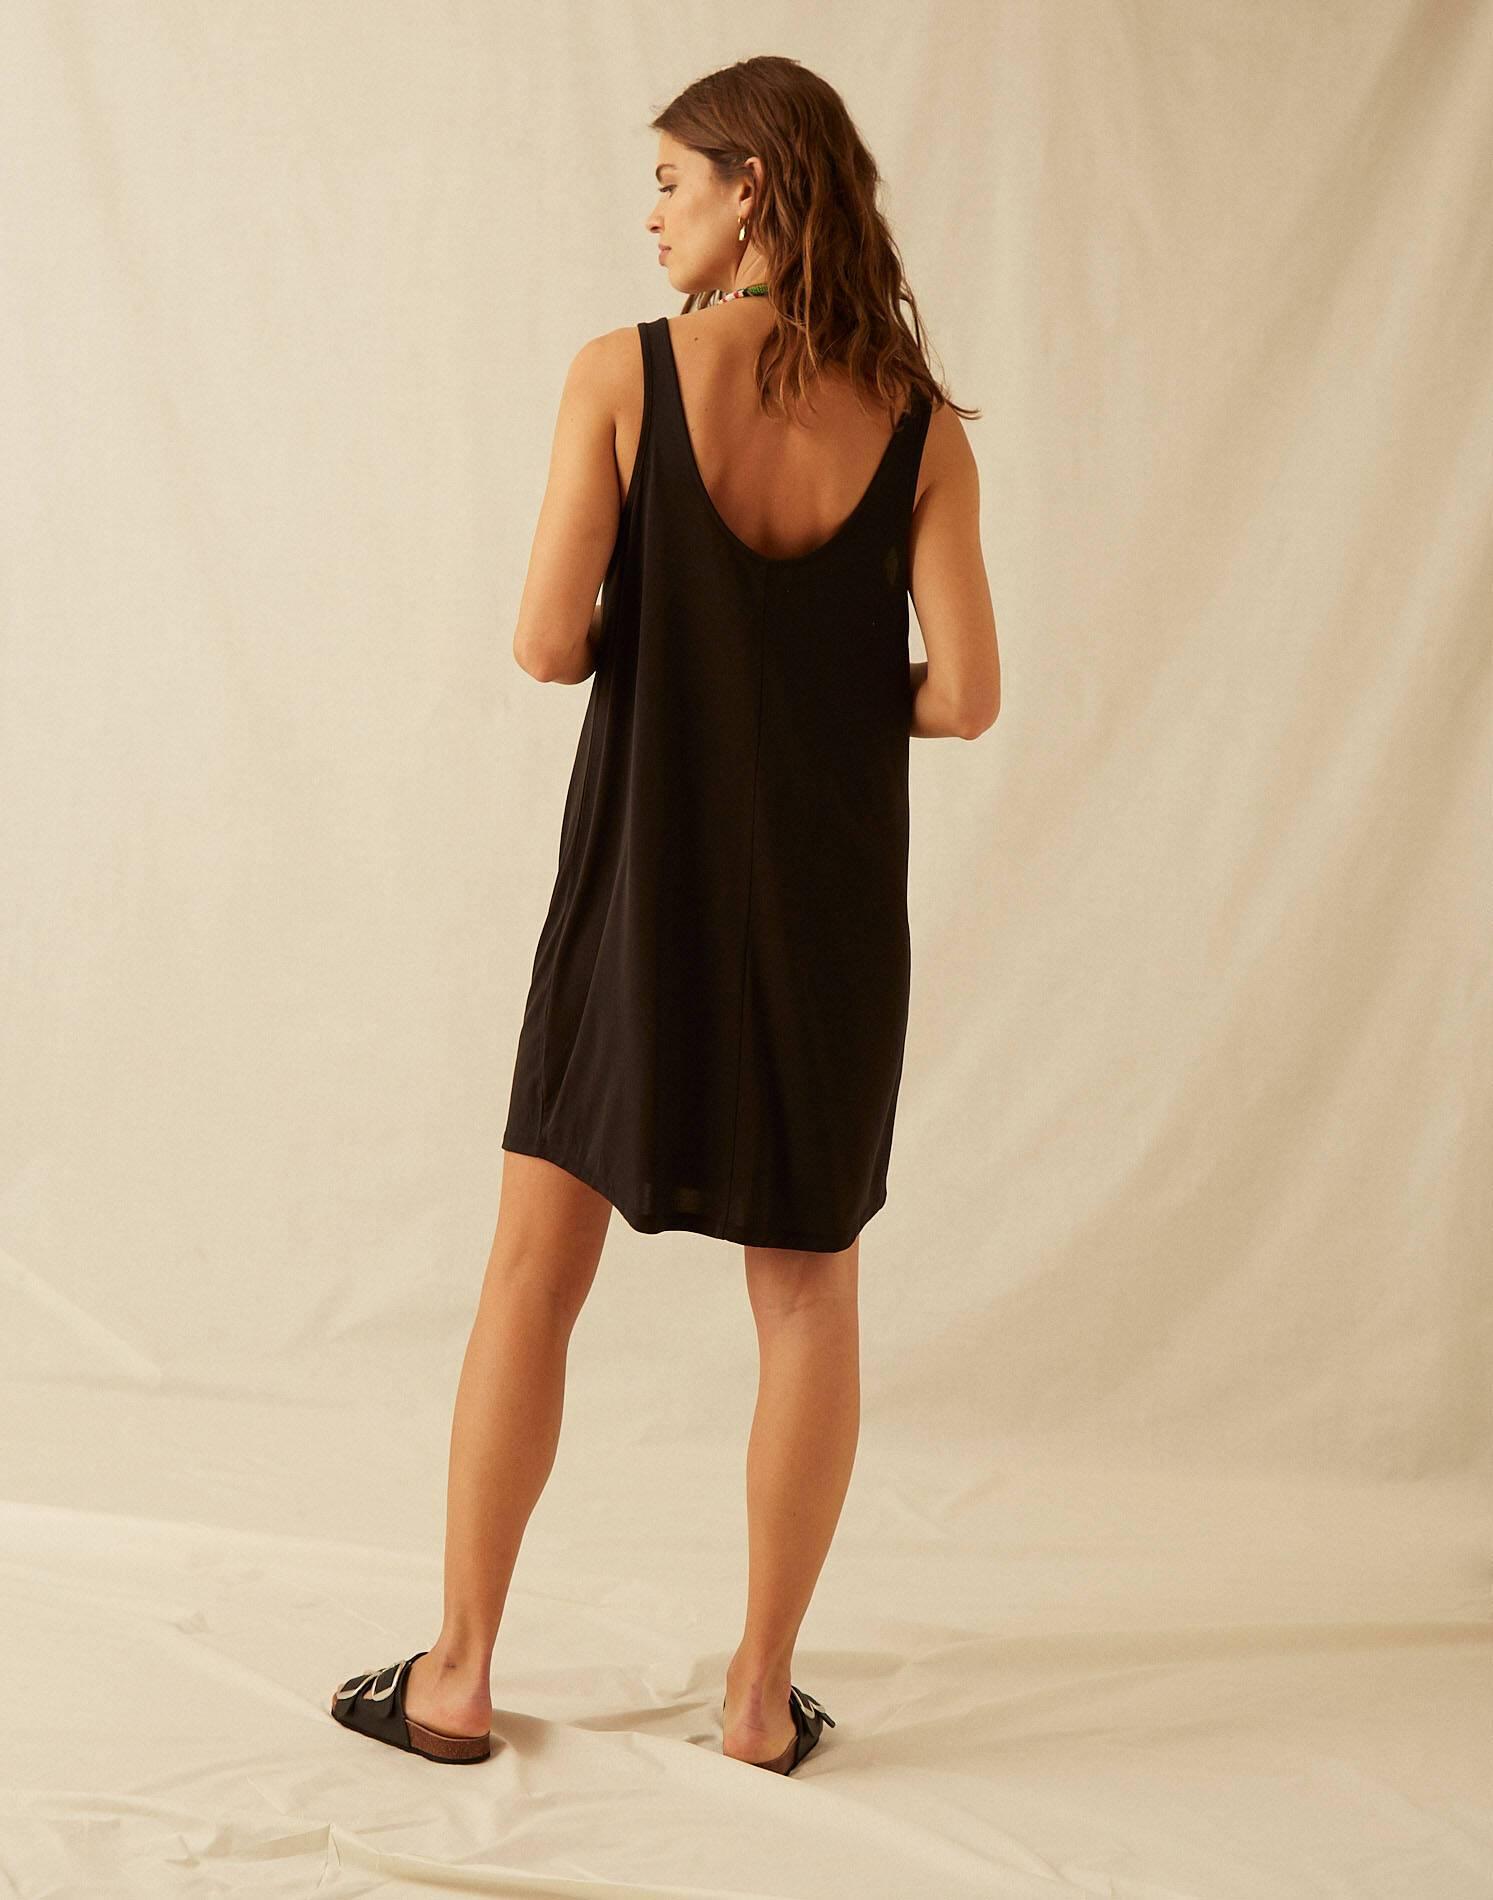 Vestido tirantes tejido amelocotonado